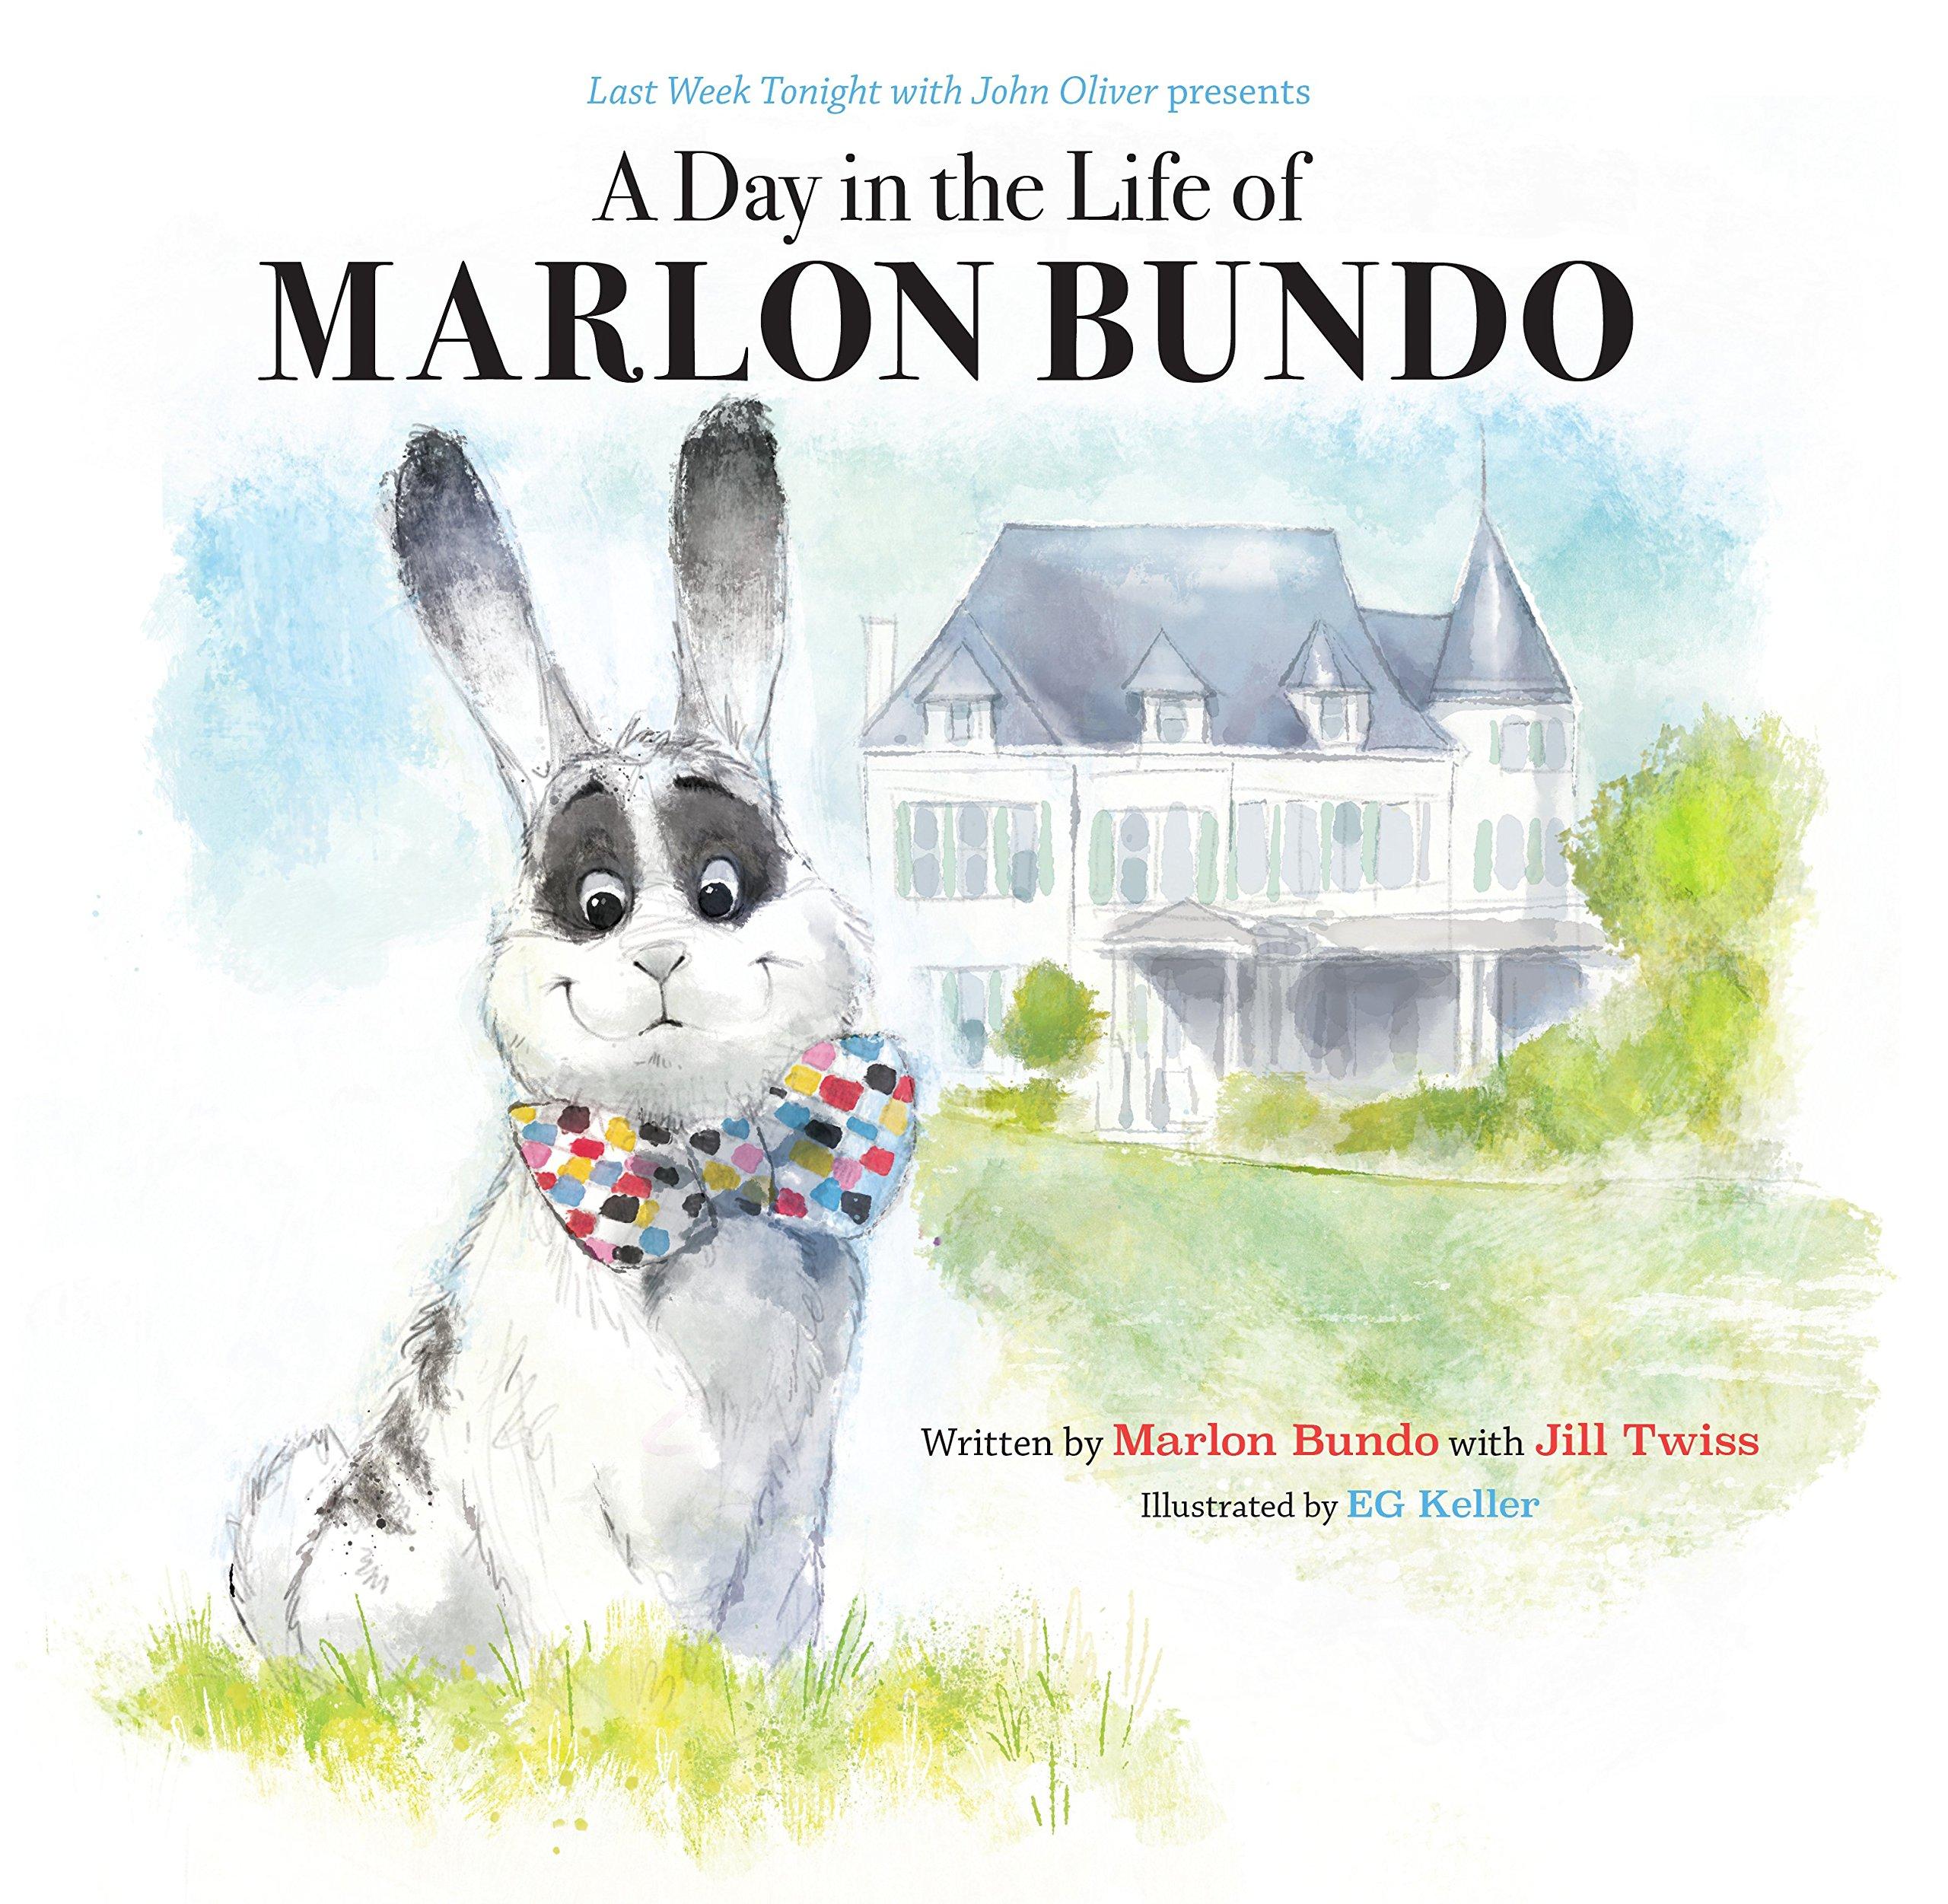 Marlon Bundo by Marlon Bundo with Jill Twiss